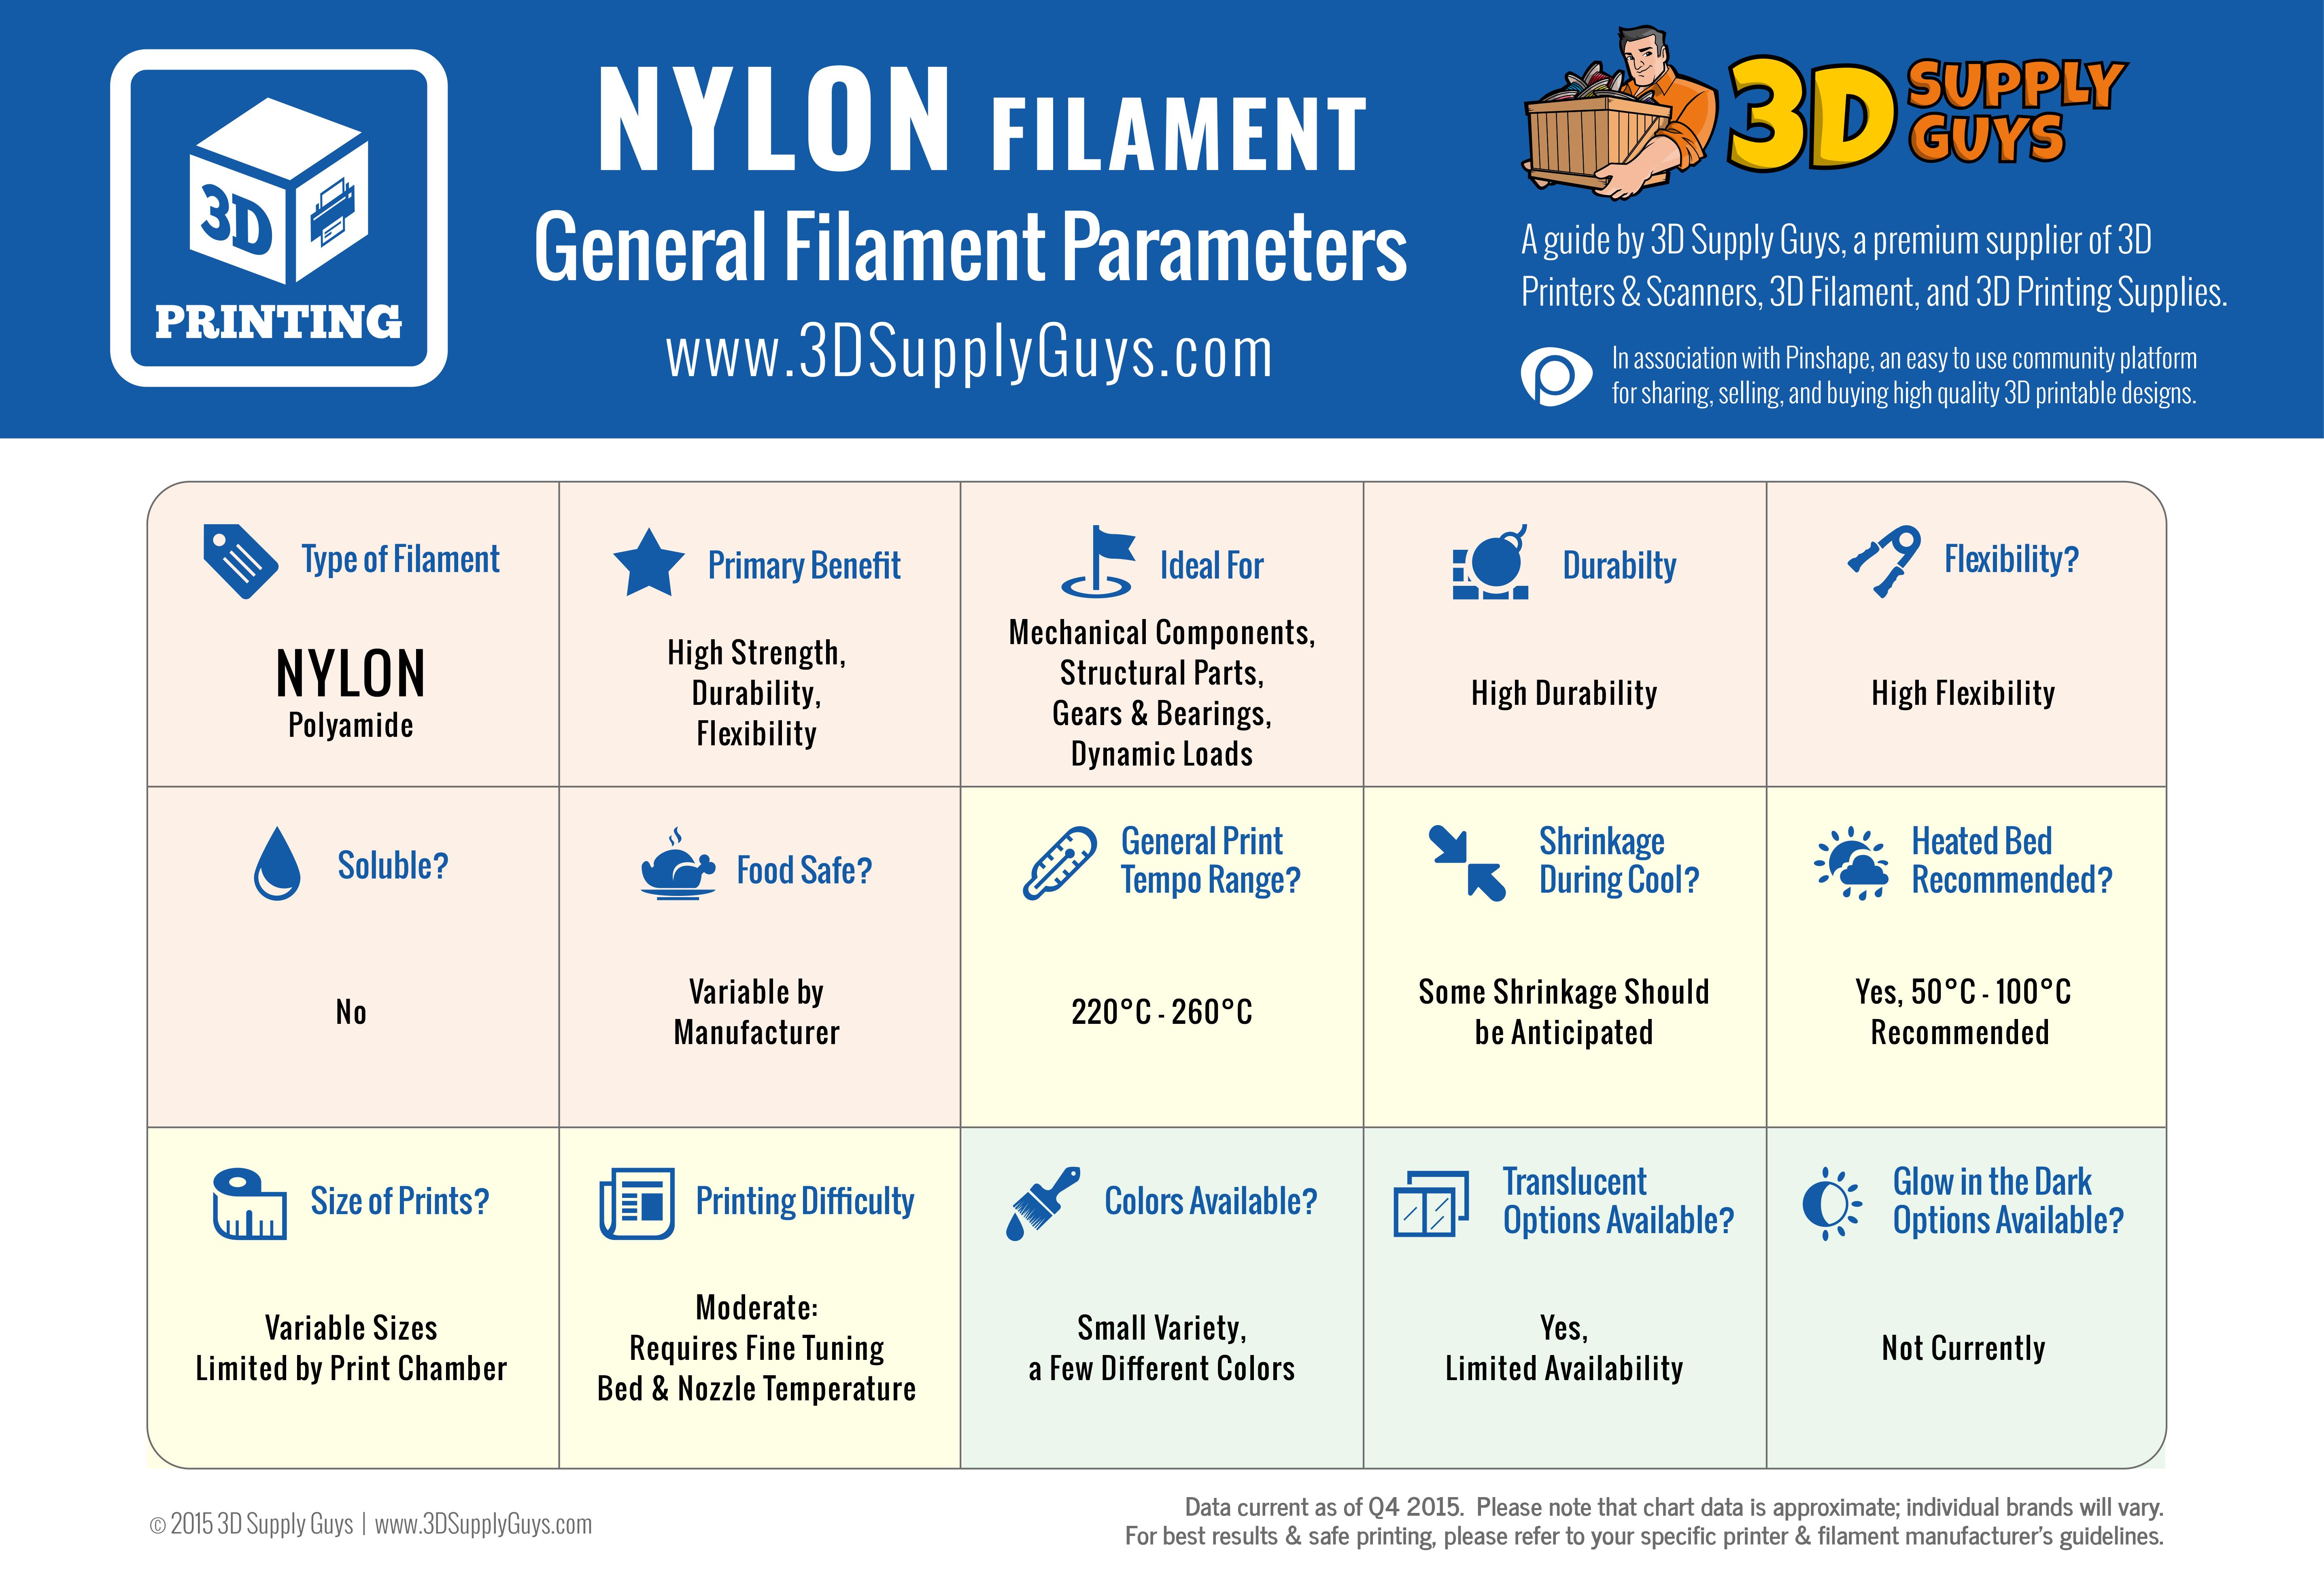 3DSupplyGuys_Filament-06_NYLON